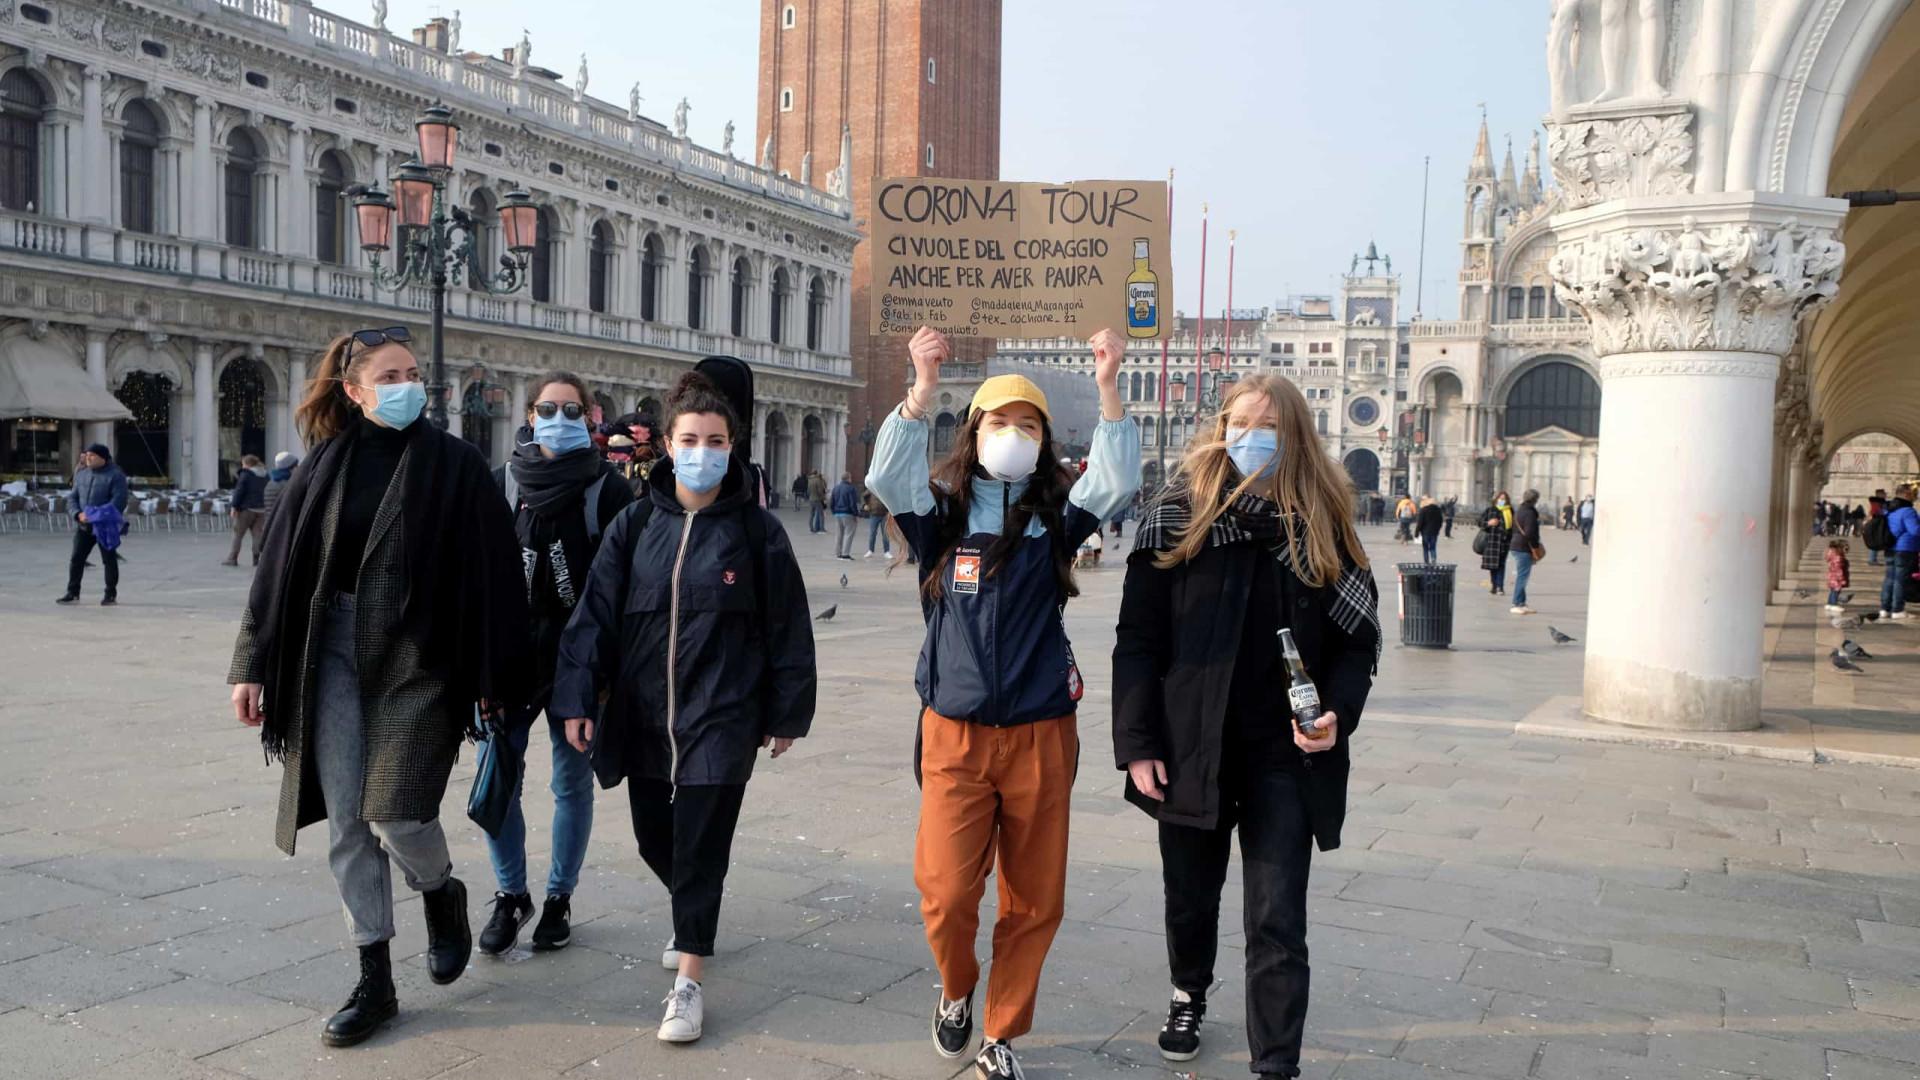 Itália: número de casos sobe para 400; número de mortos segue 12